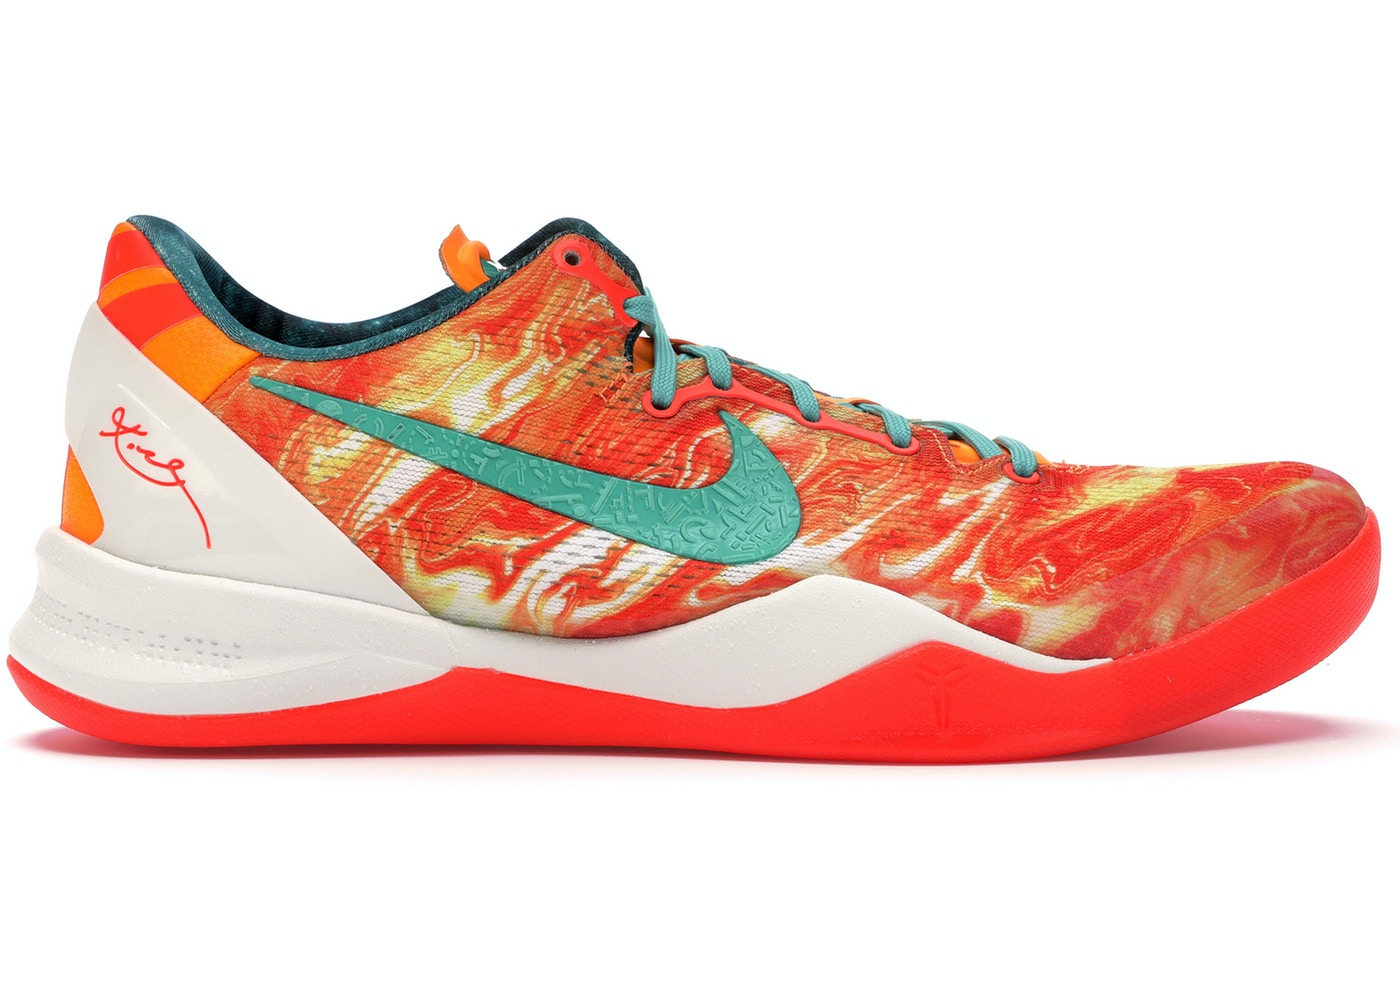 Osszerakni Peldatlan Alca Nike Kobe 8 Ar Alhudaaz Org